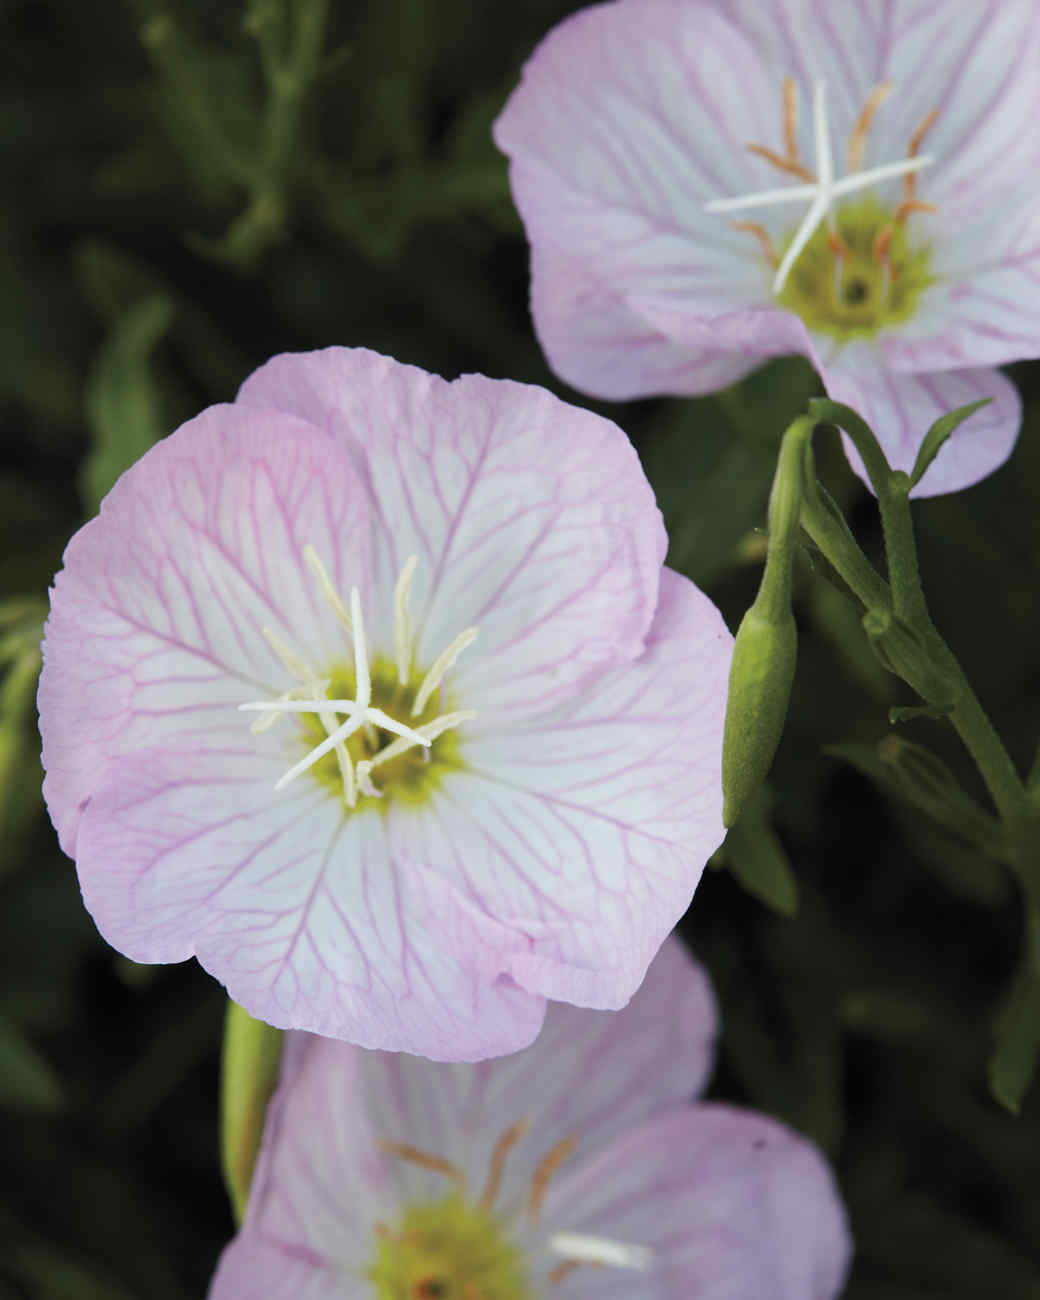 lavenderblue-md110341.jpg